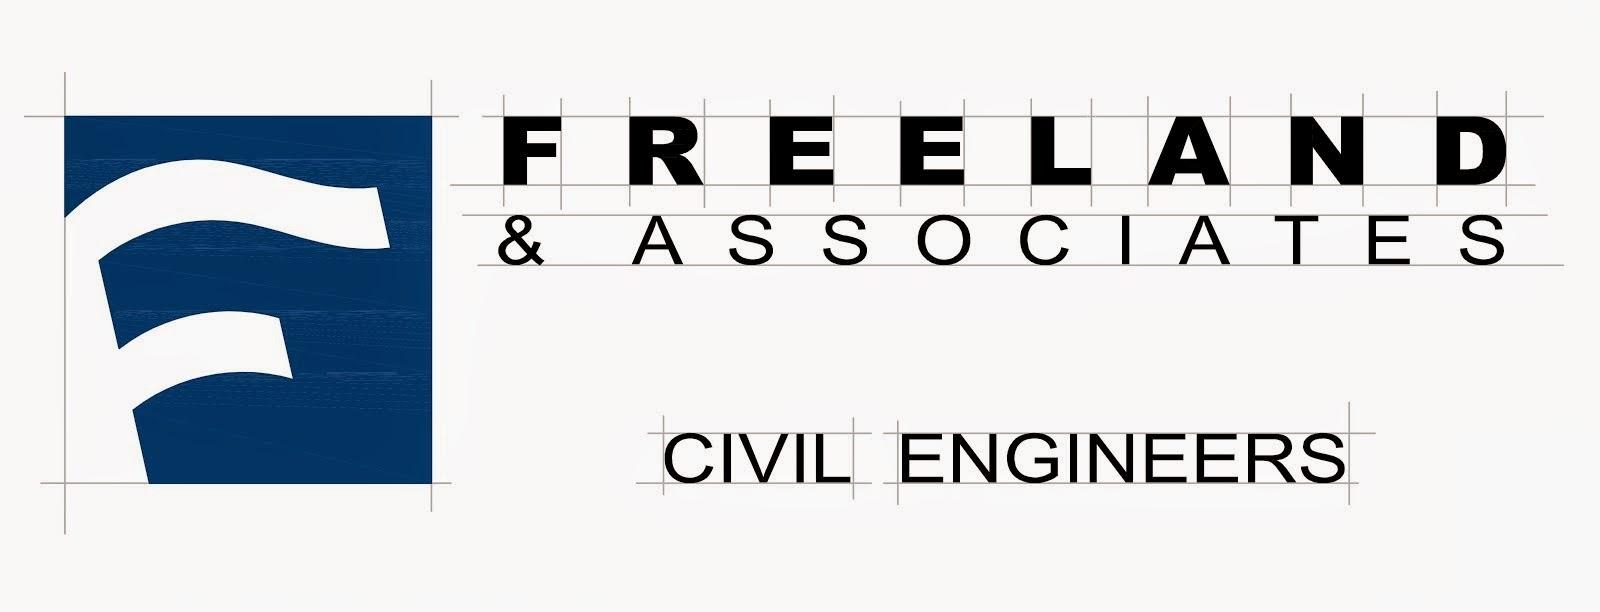 Freeland and Associates